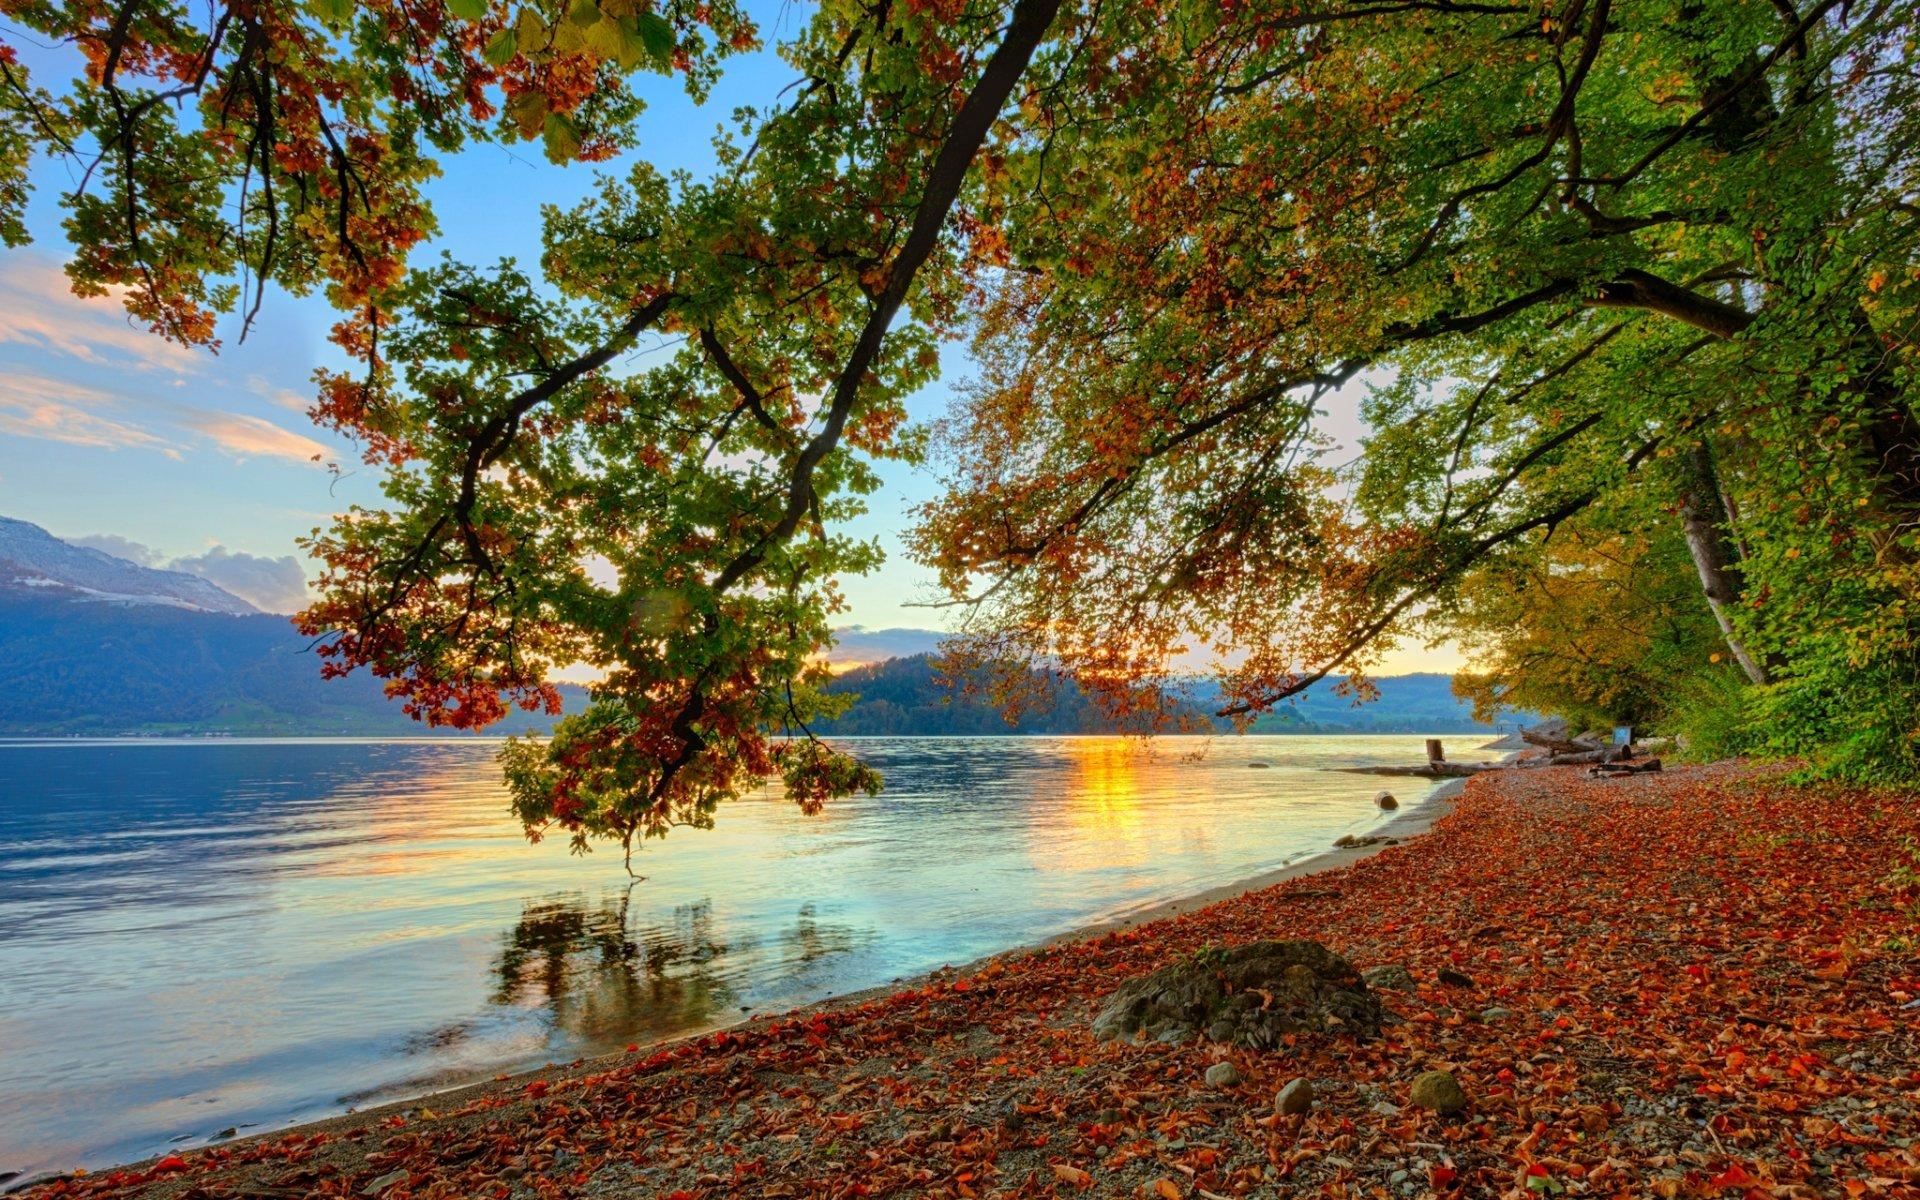 Autumn Fall Wallpaper 1600x900 Autumnal Tune Hd Wallpaper Background Image 2048x1280